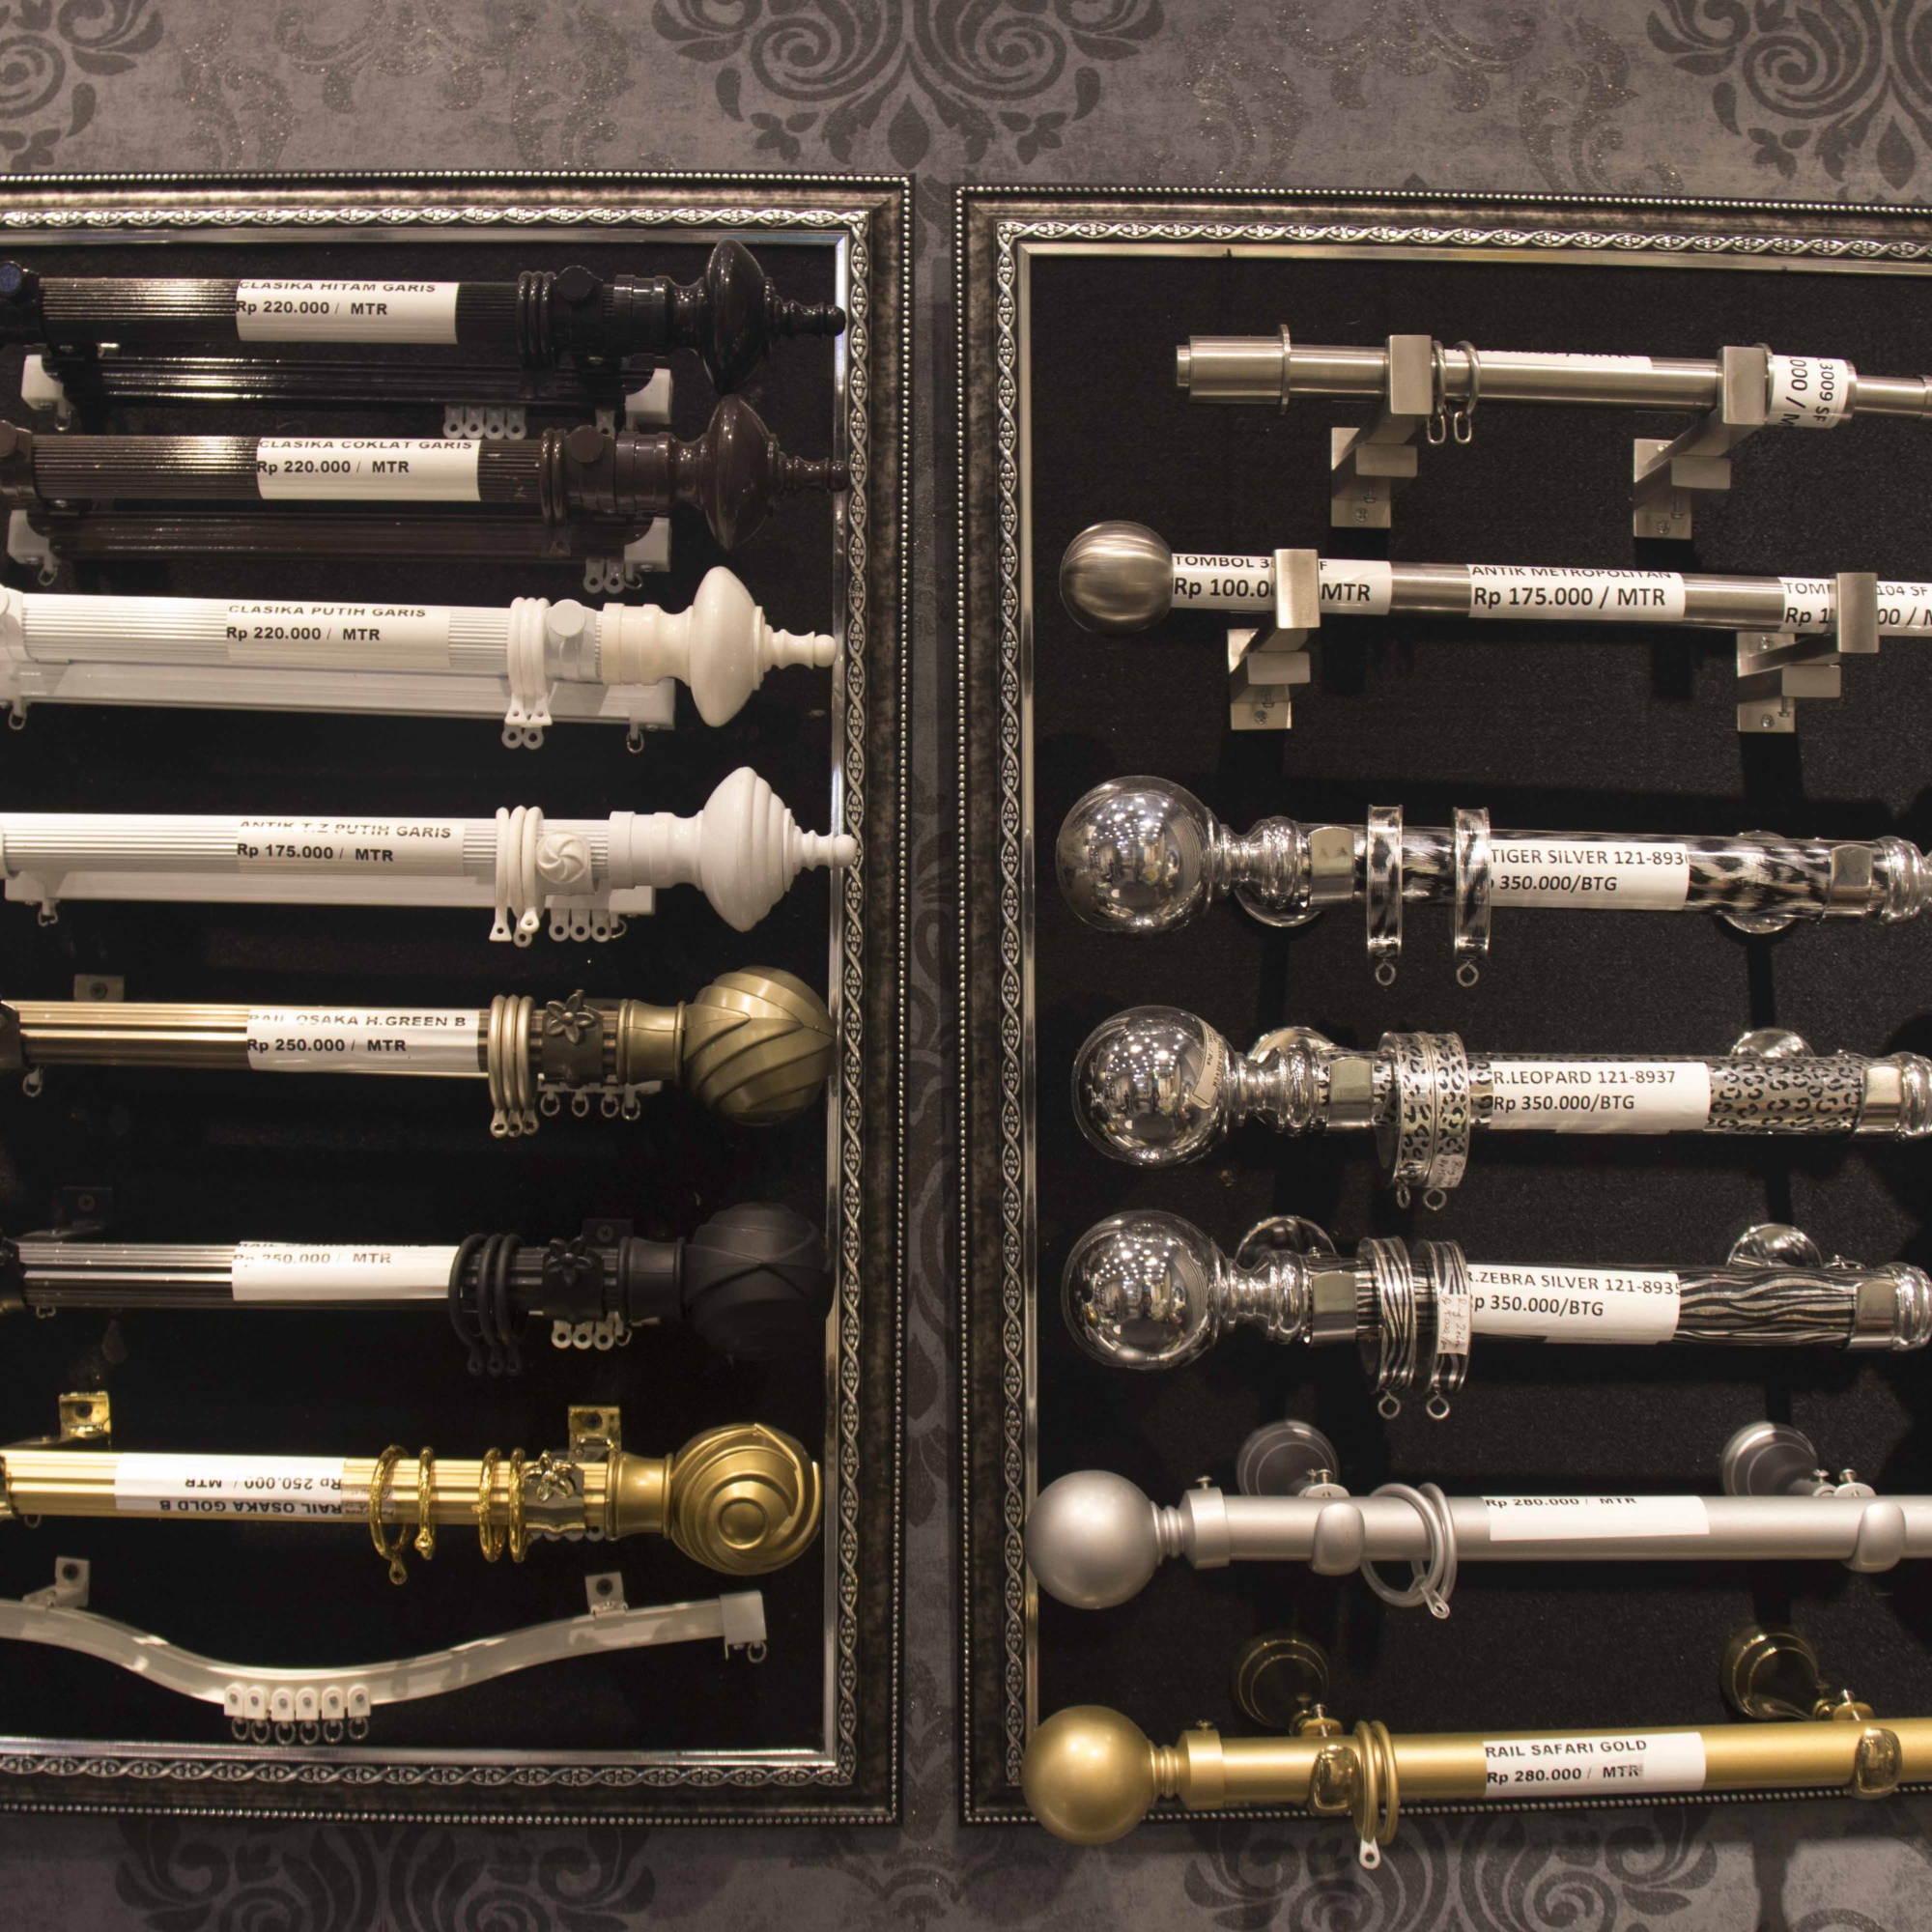 Accessories-Image-Serba-Antik